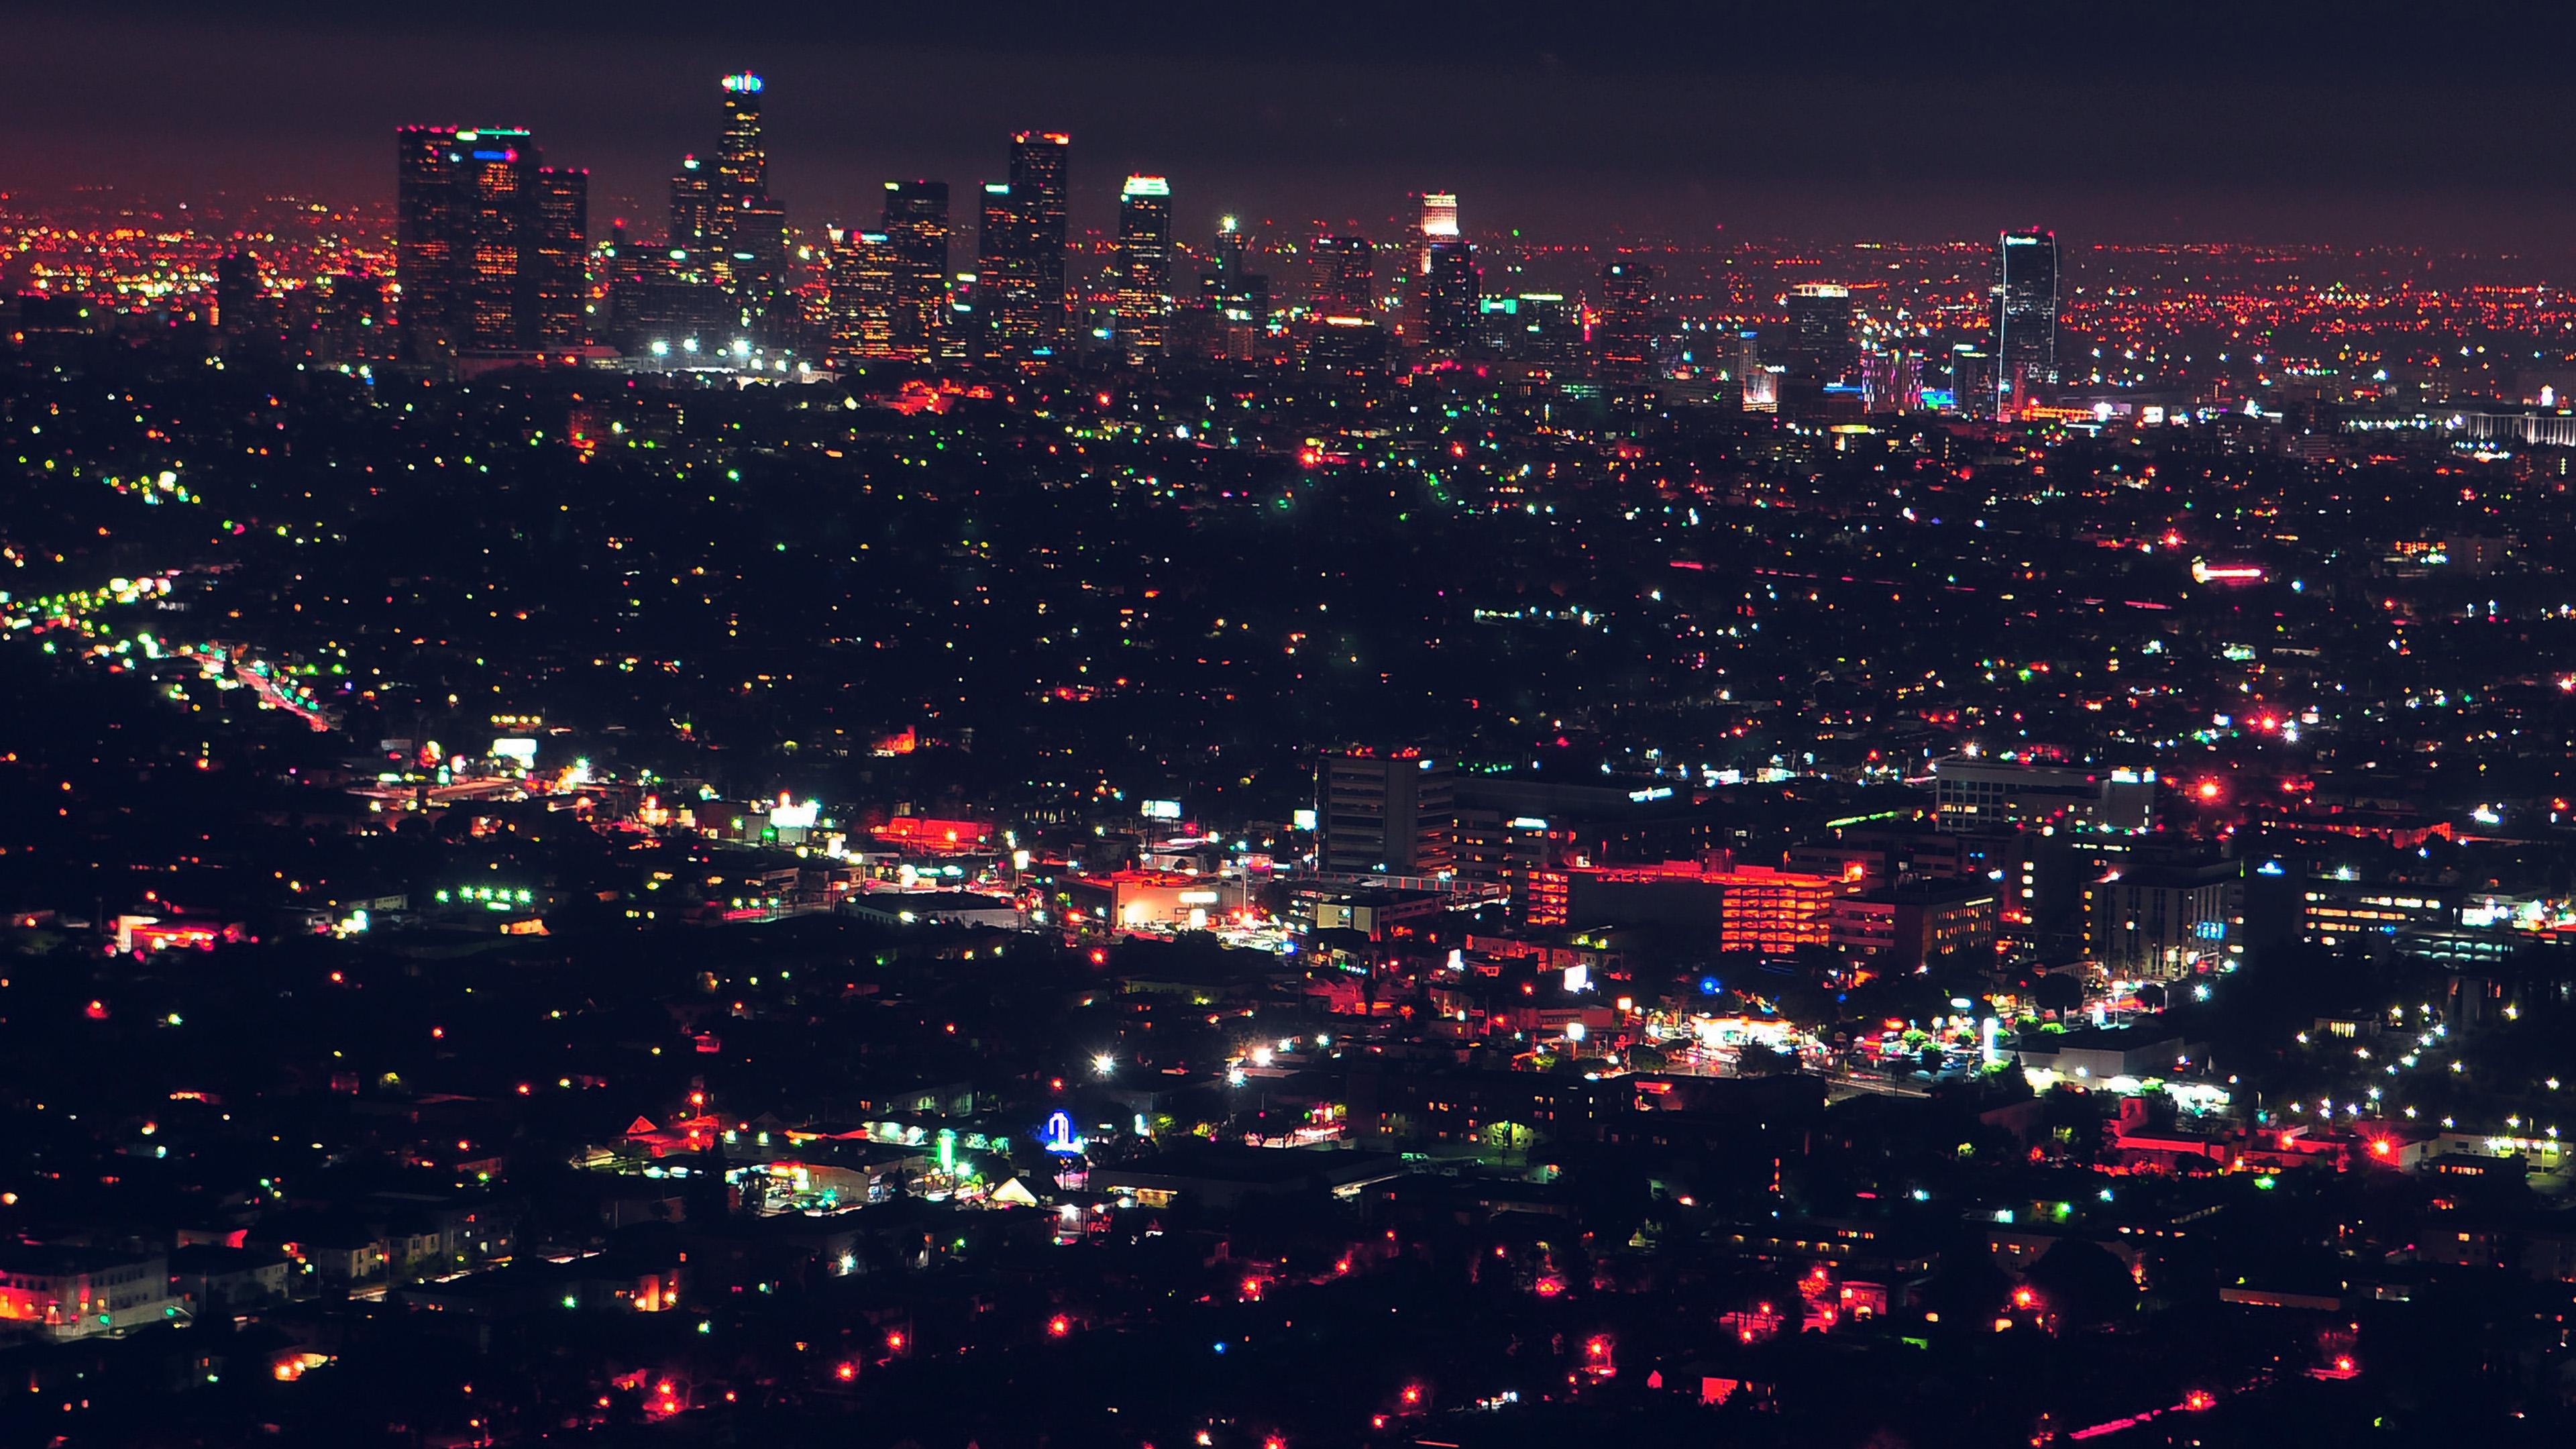 Wallpaper for desktop laptop nd64 city view night light red - Night light city wallpaper ...